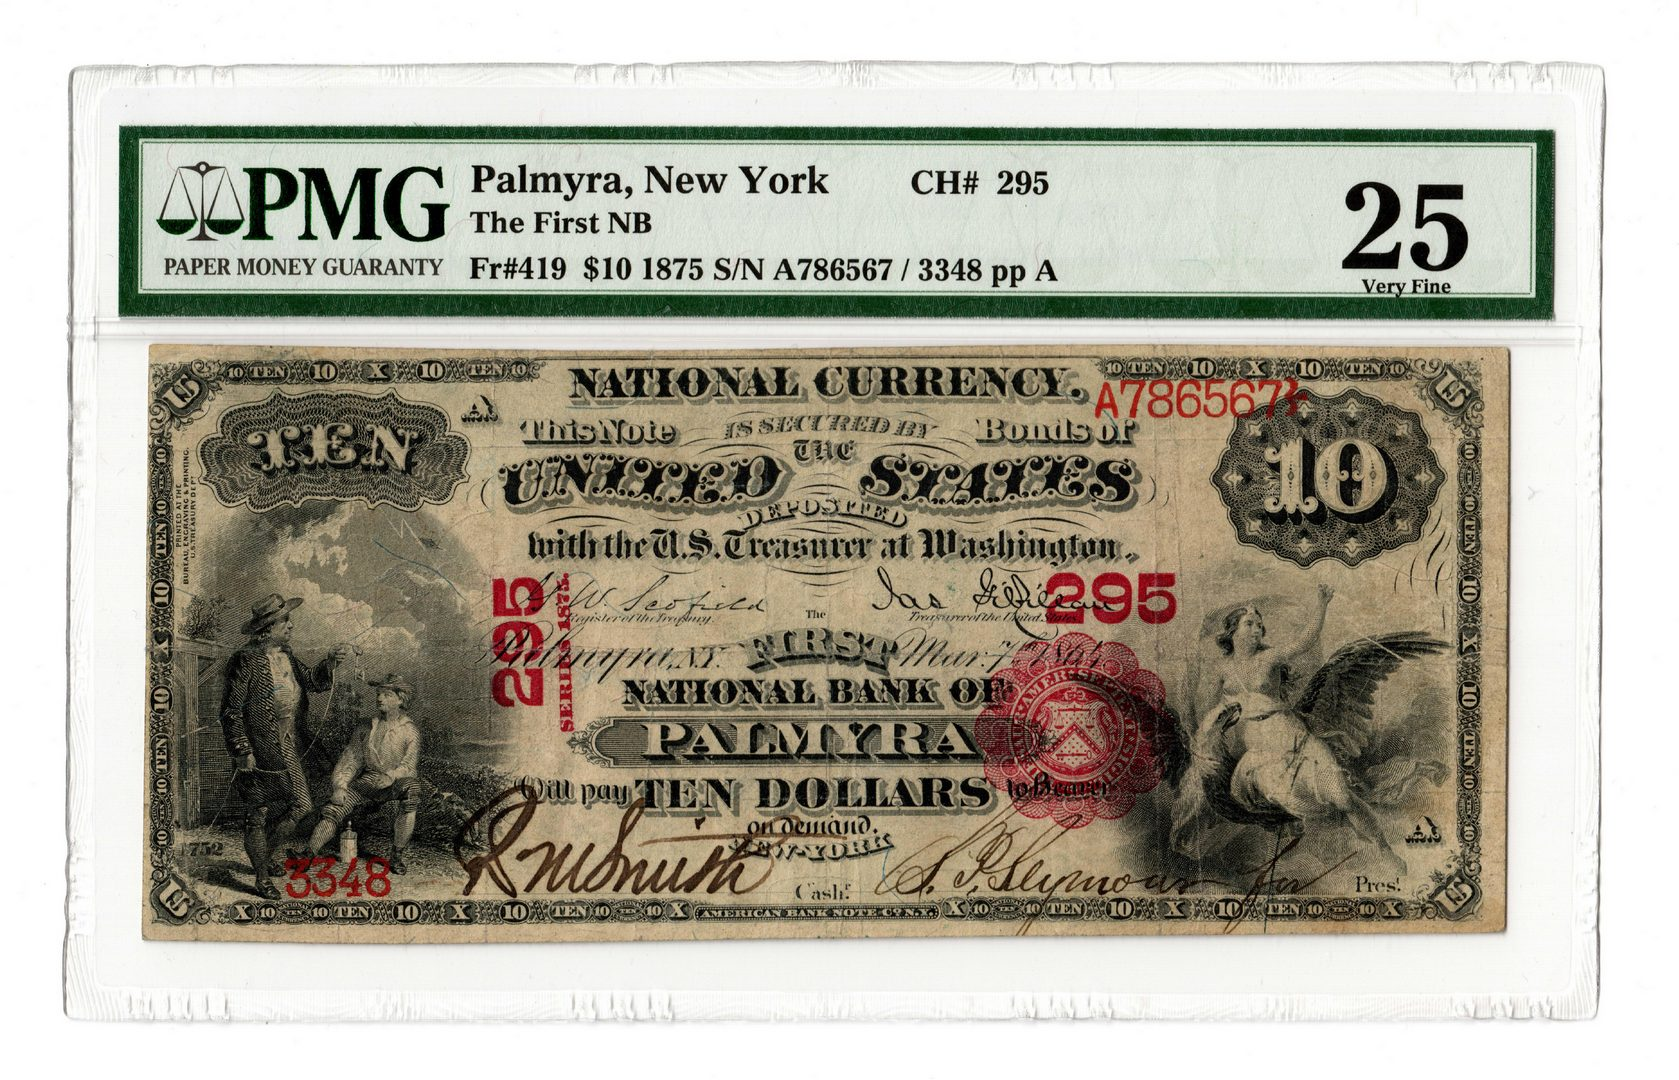 Lot 96: 1857 $10 First National Bank of Palmyra, NY Nation